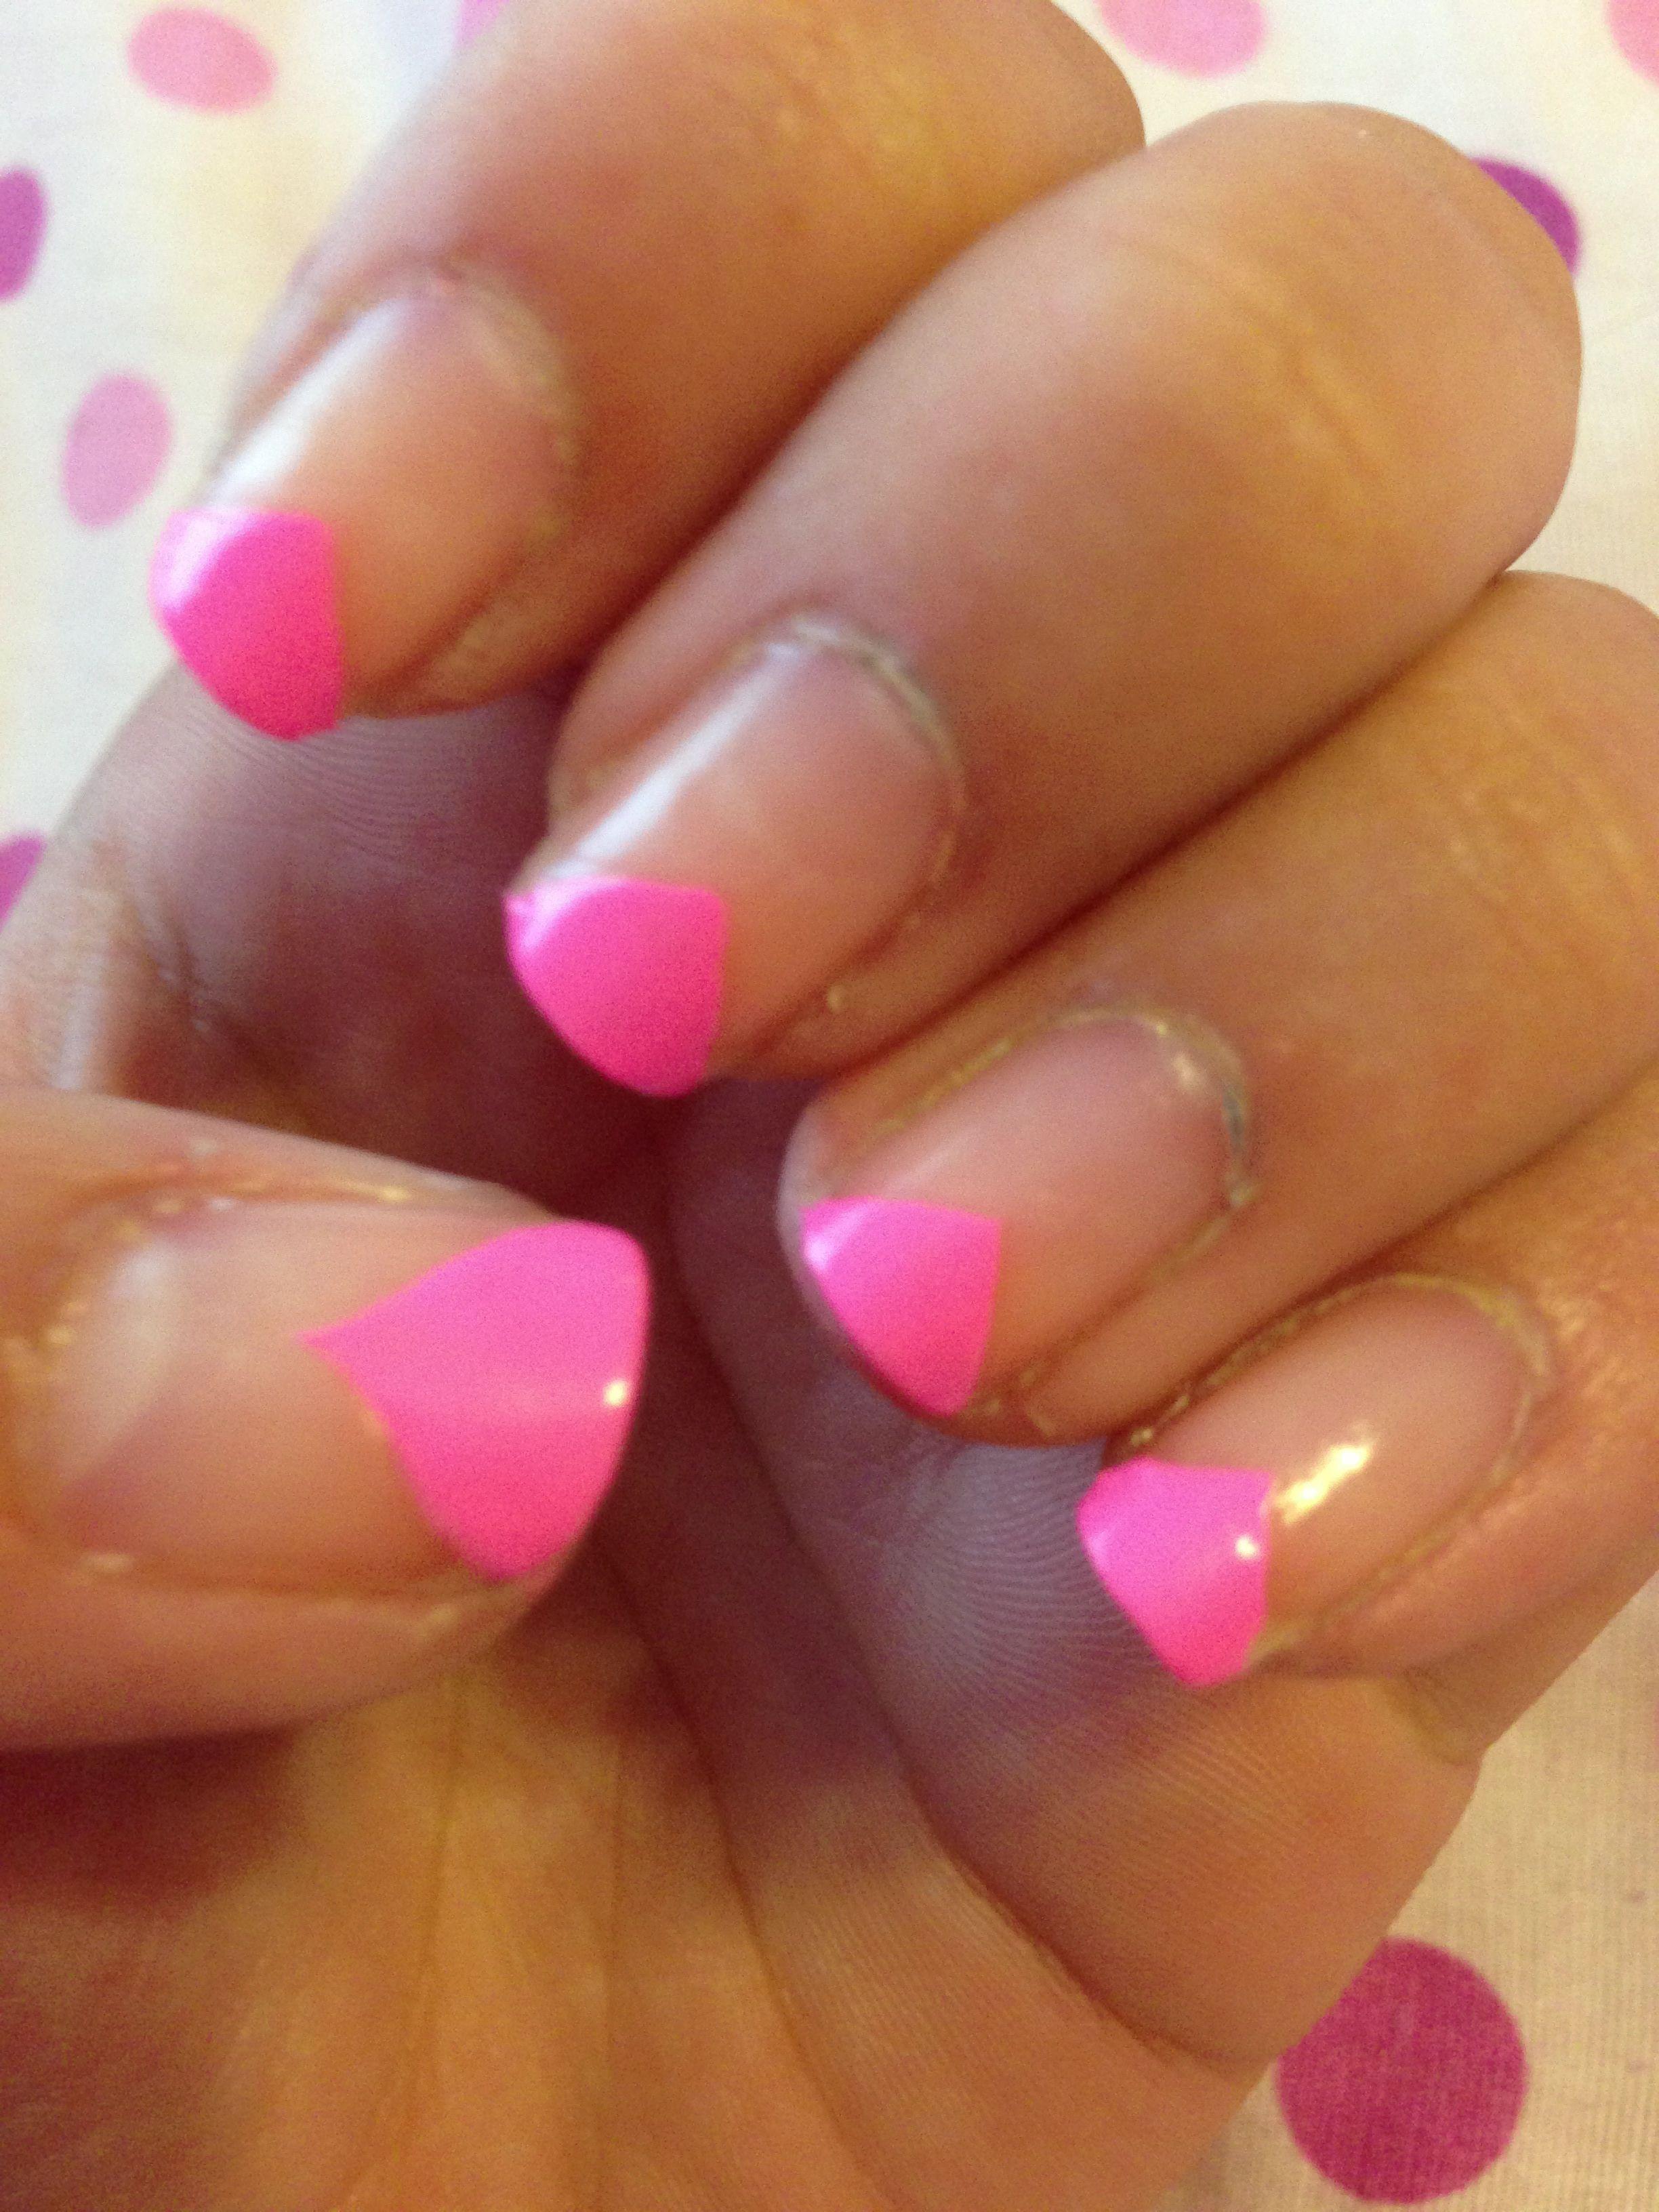 Neon french tip nails | Nails, French tip nails, Nail tips